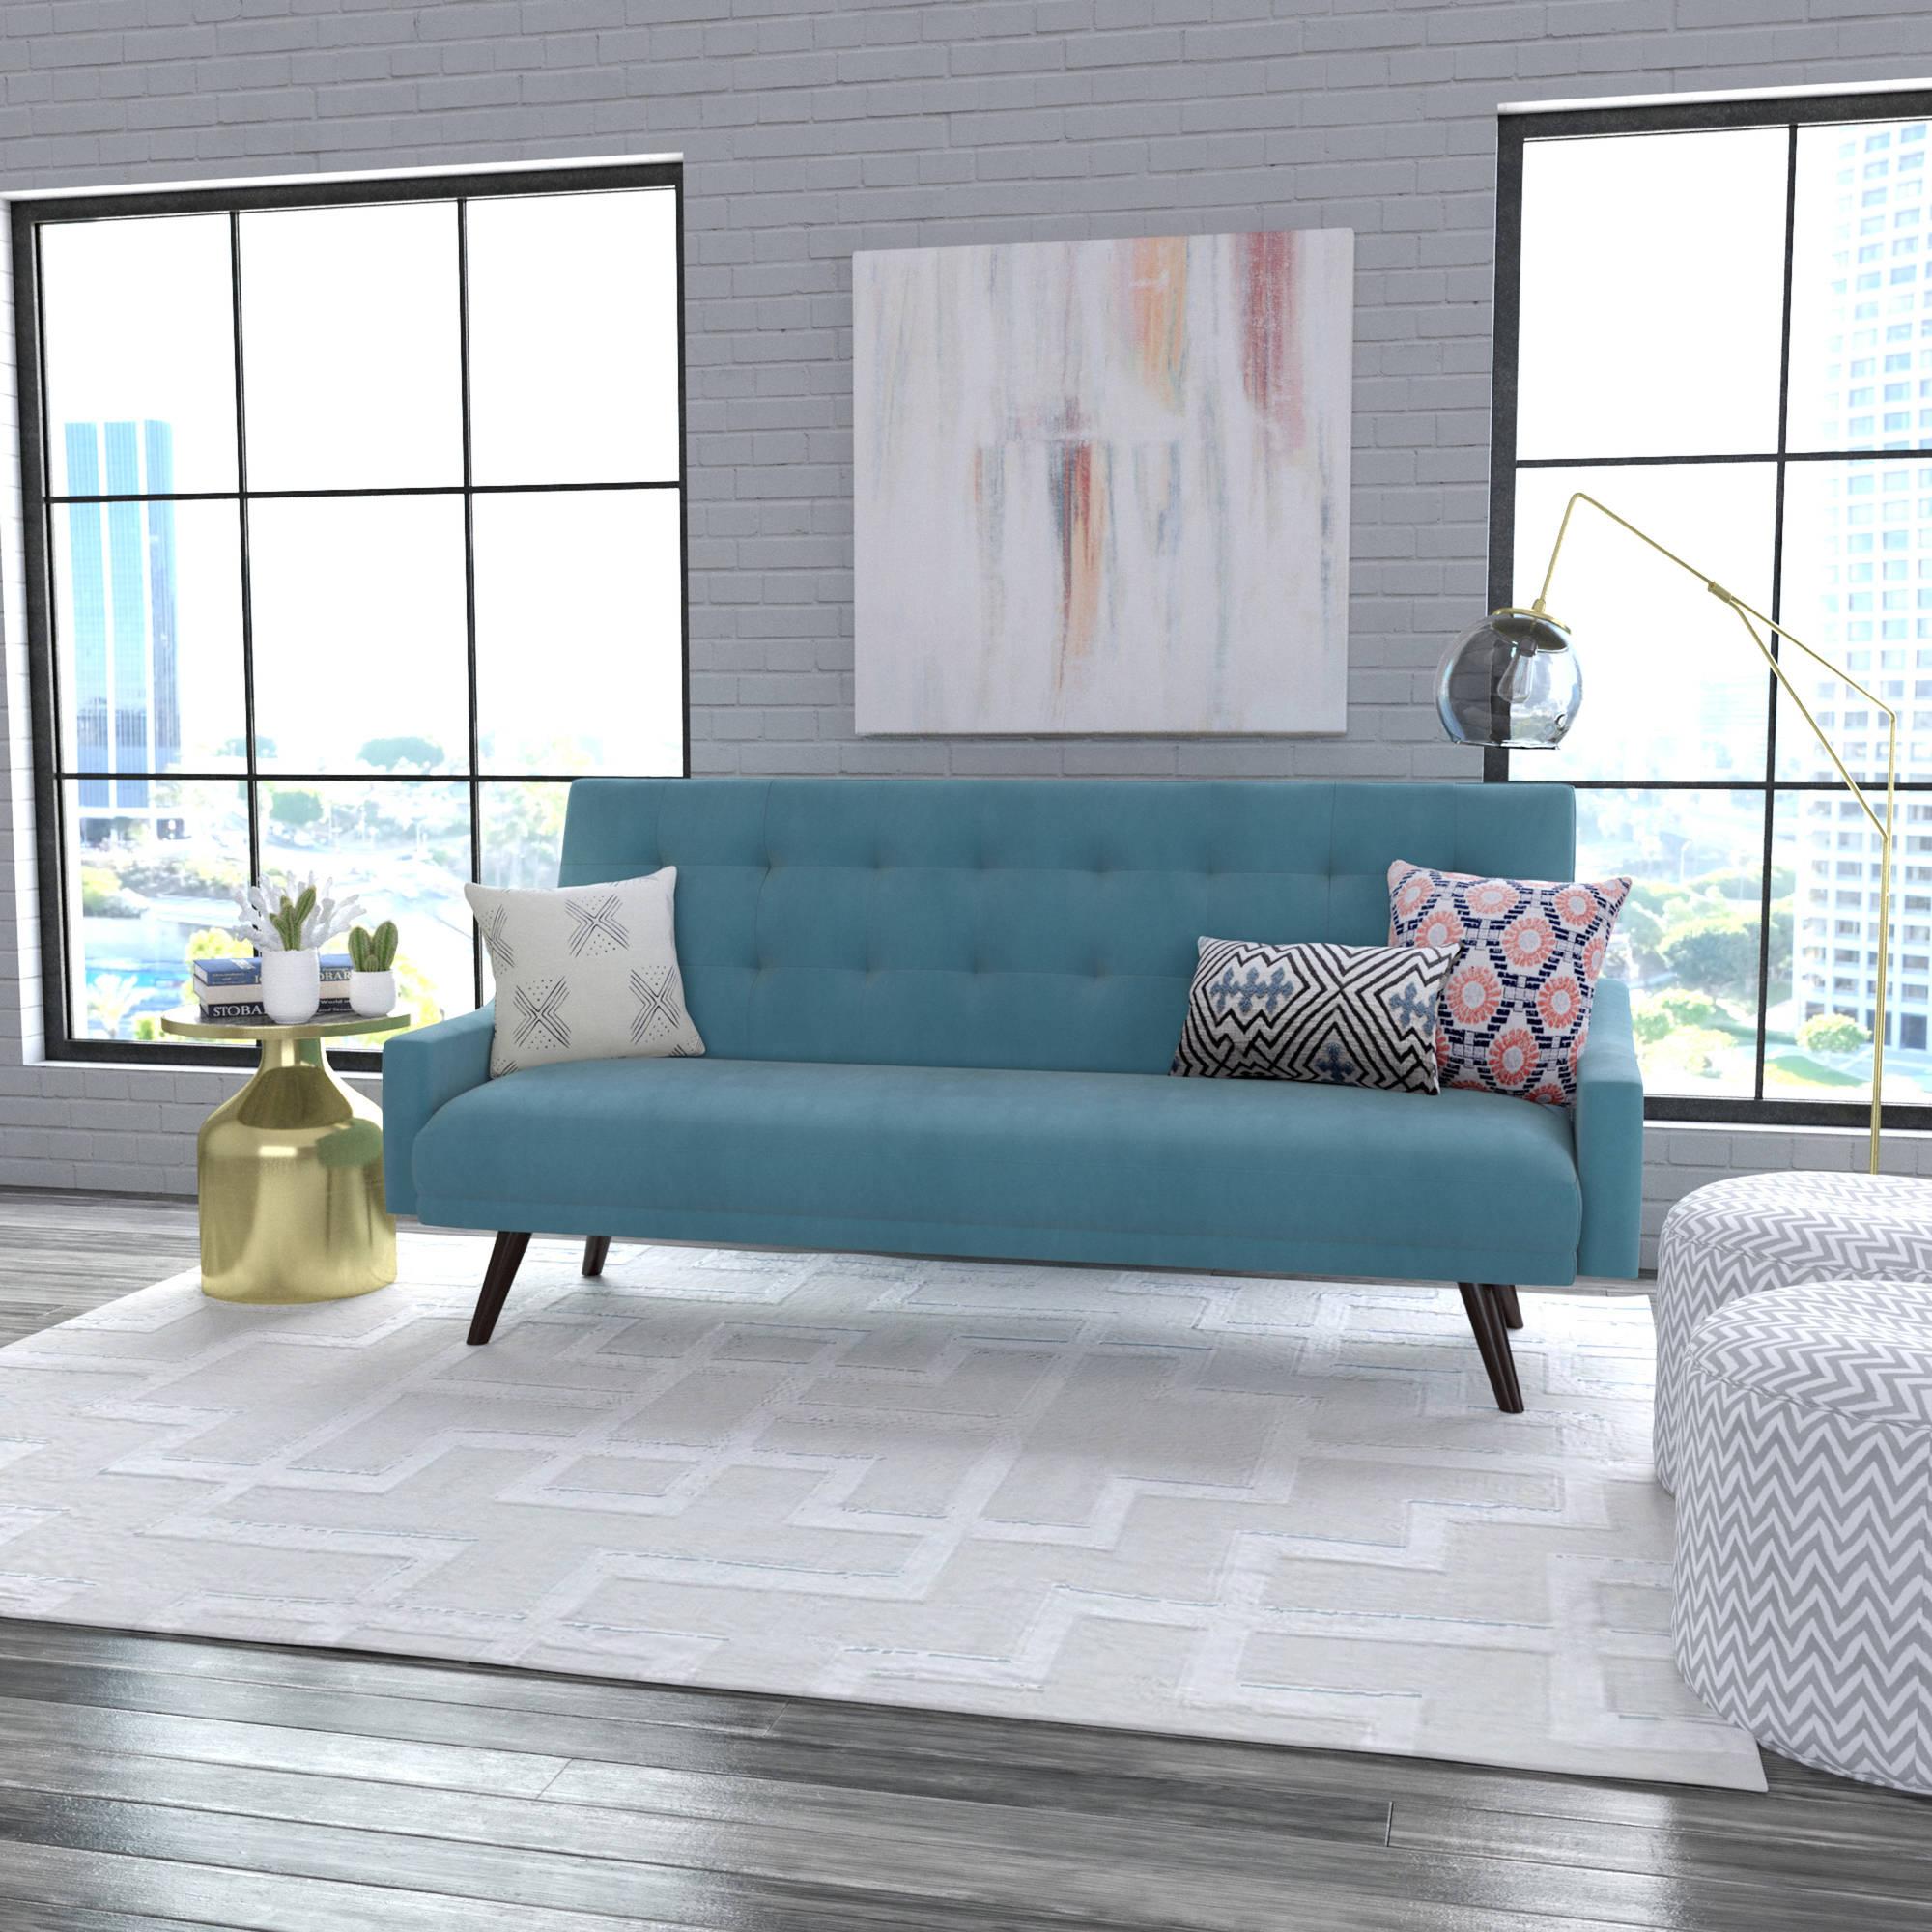 oakland futon sofa bed, multiple colors - walmart